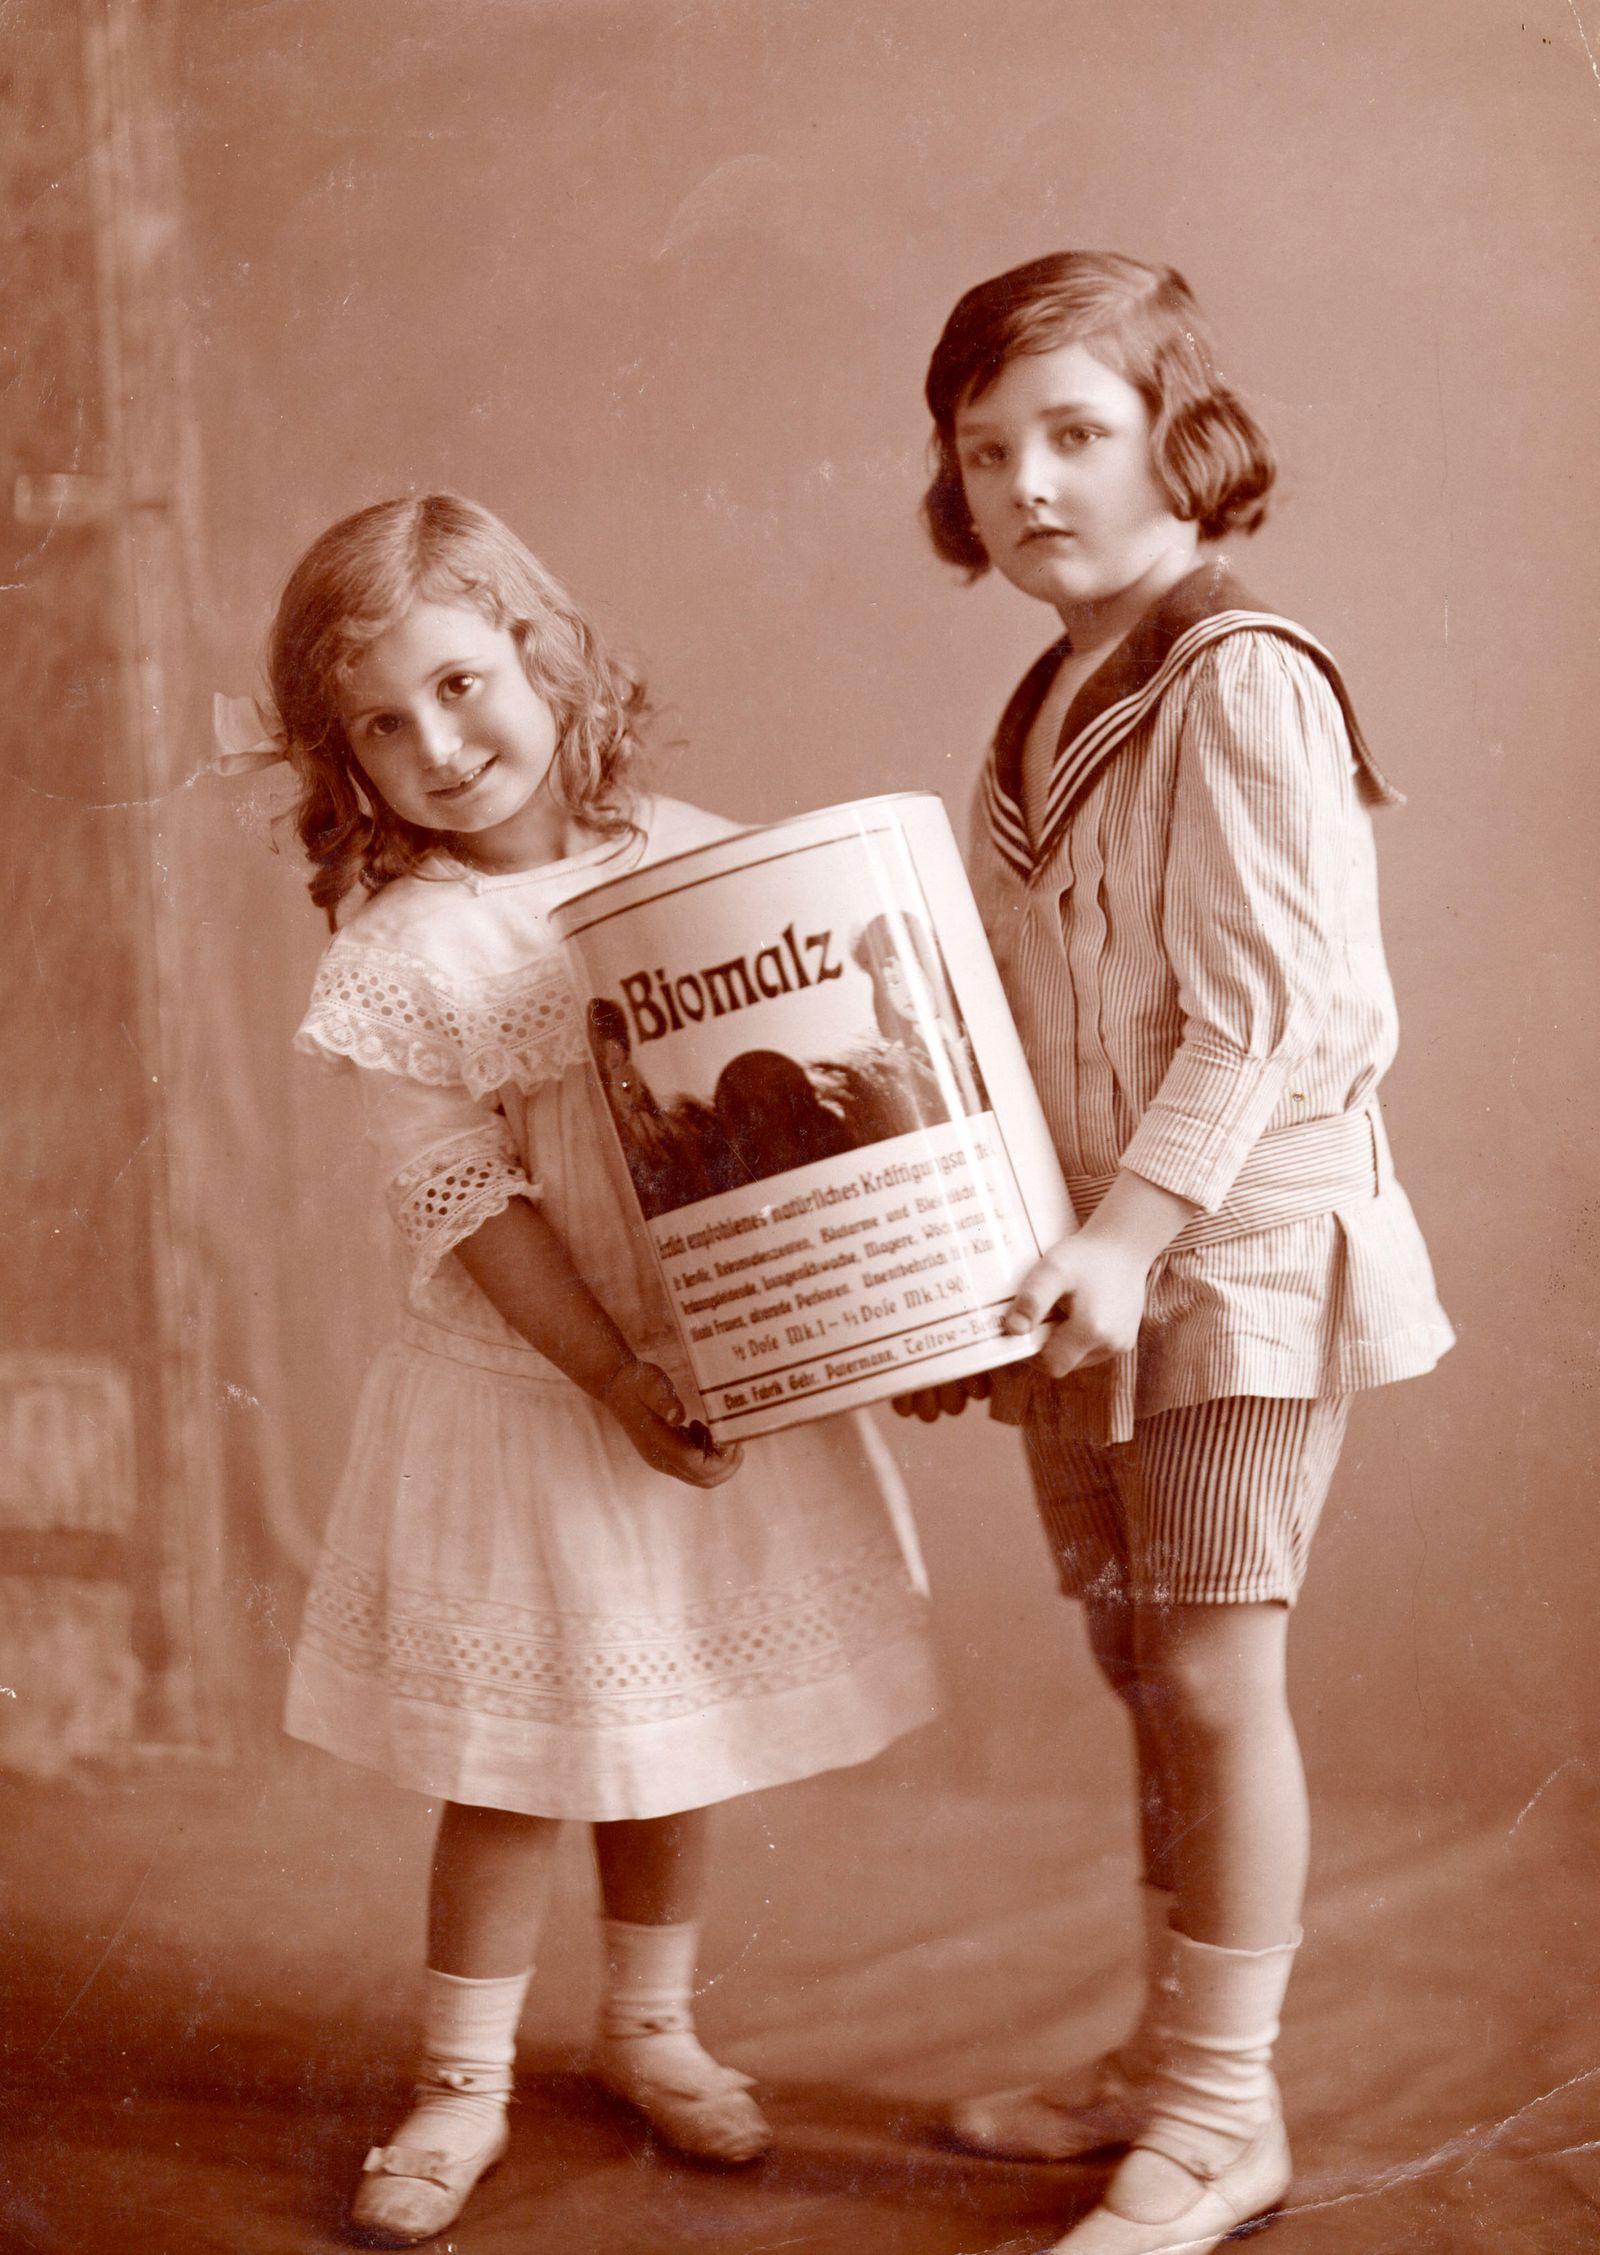 Wate On Werbung - Biomalz-Werbung / Foto um 1915